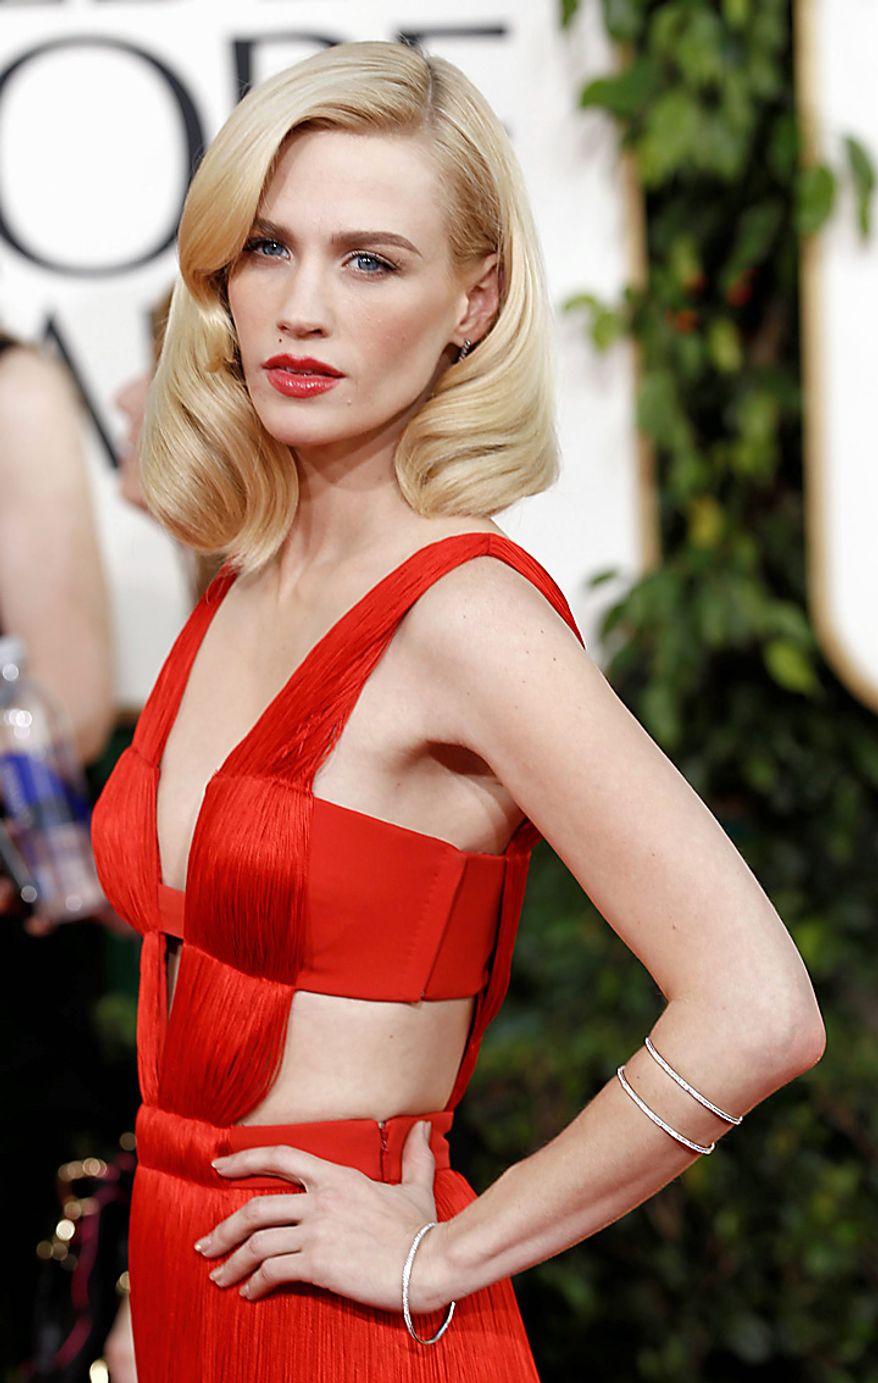 Actress January Jones arrives at the Golden Globe Awards Sunday, Jan. 16, 2011, in Beverly Hills, Calif. (AP Photo/Matt Sayles)